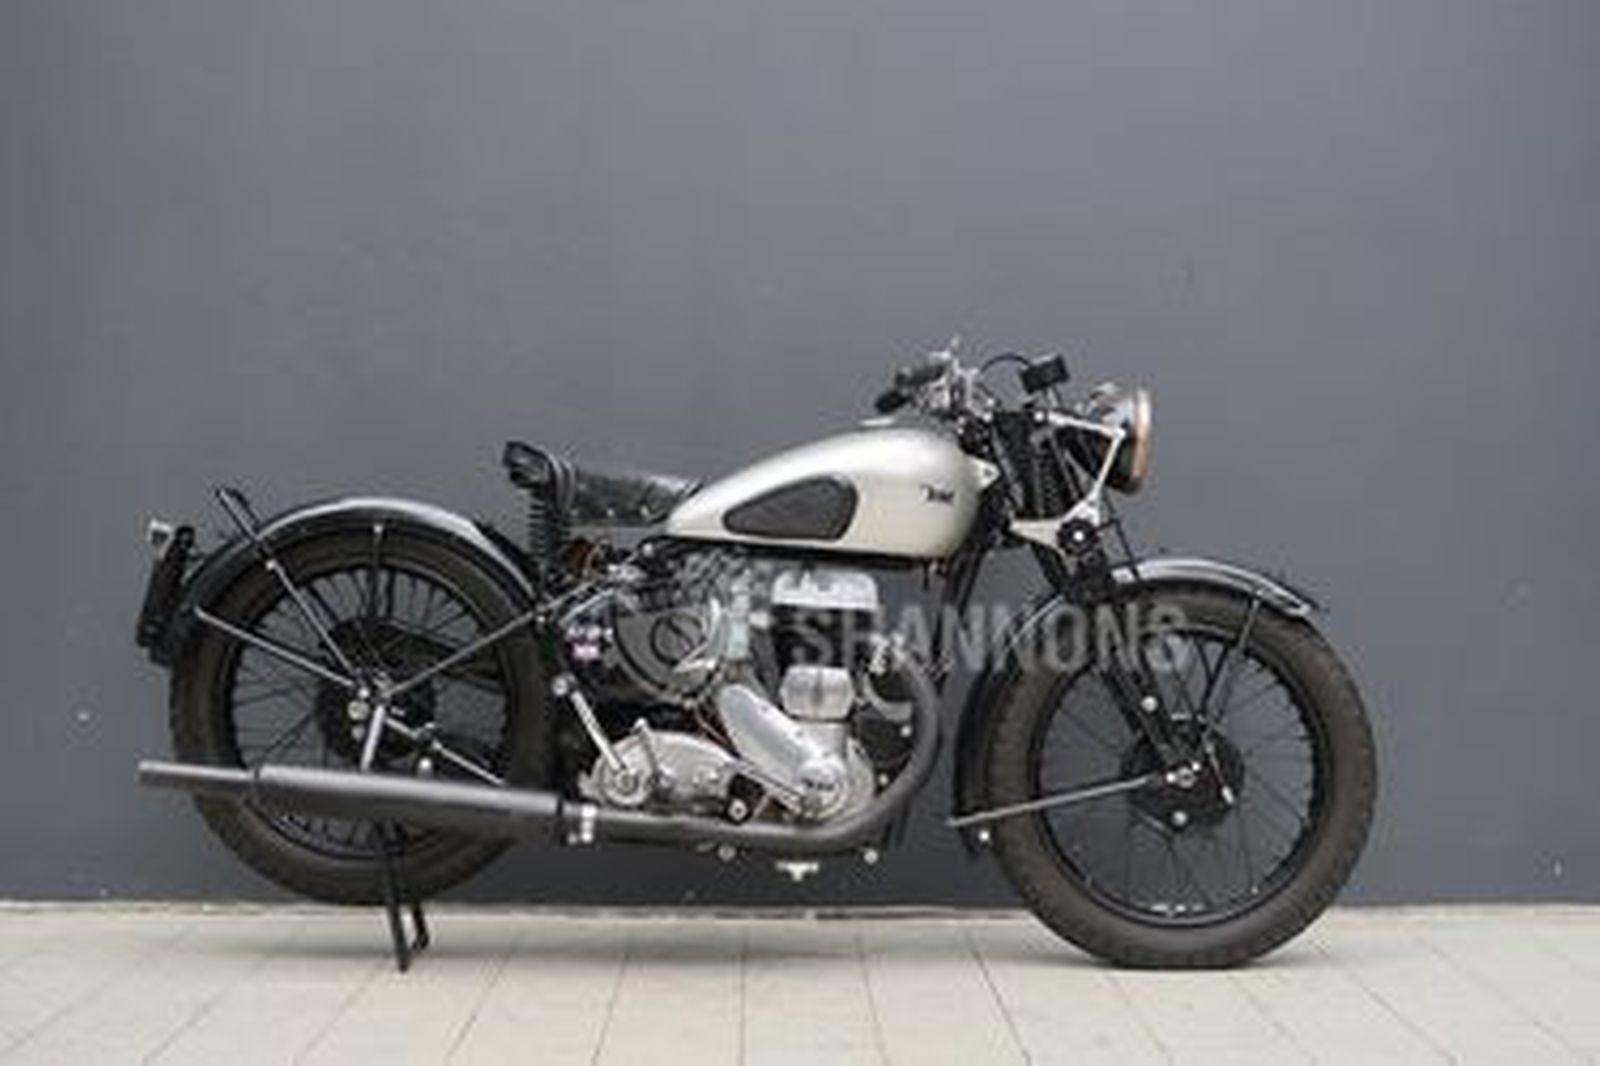 BSA M21 600cc Motorcycle